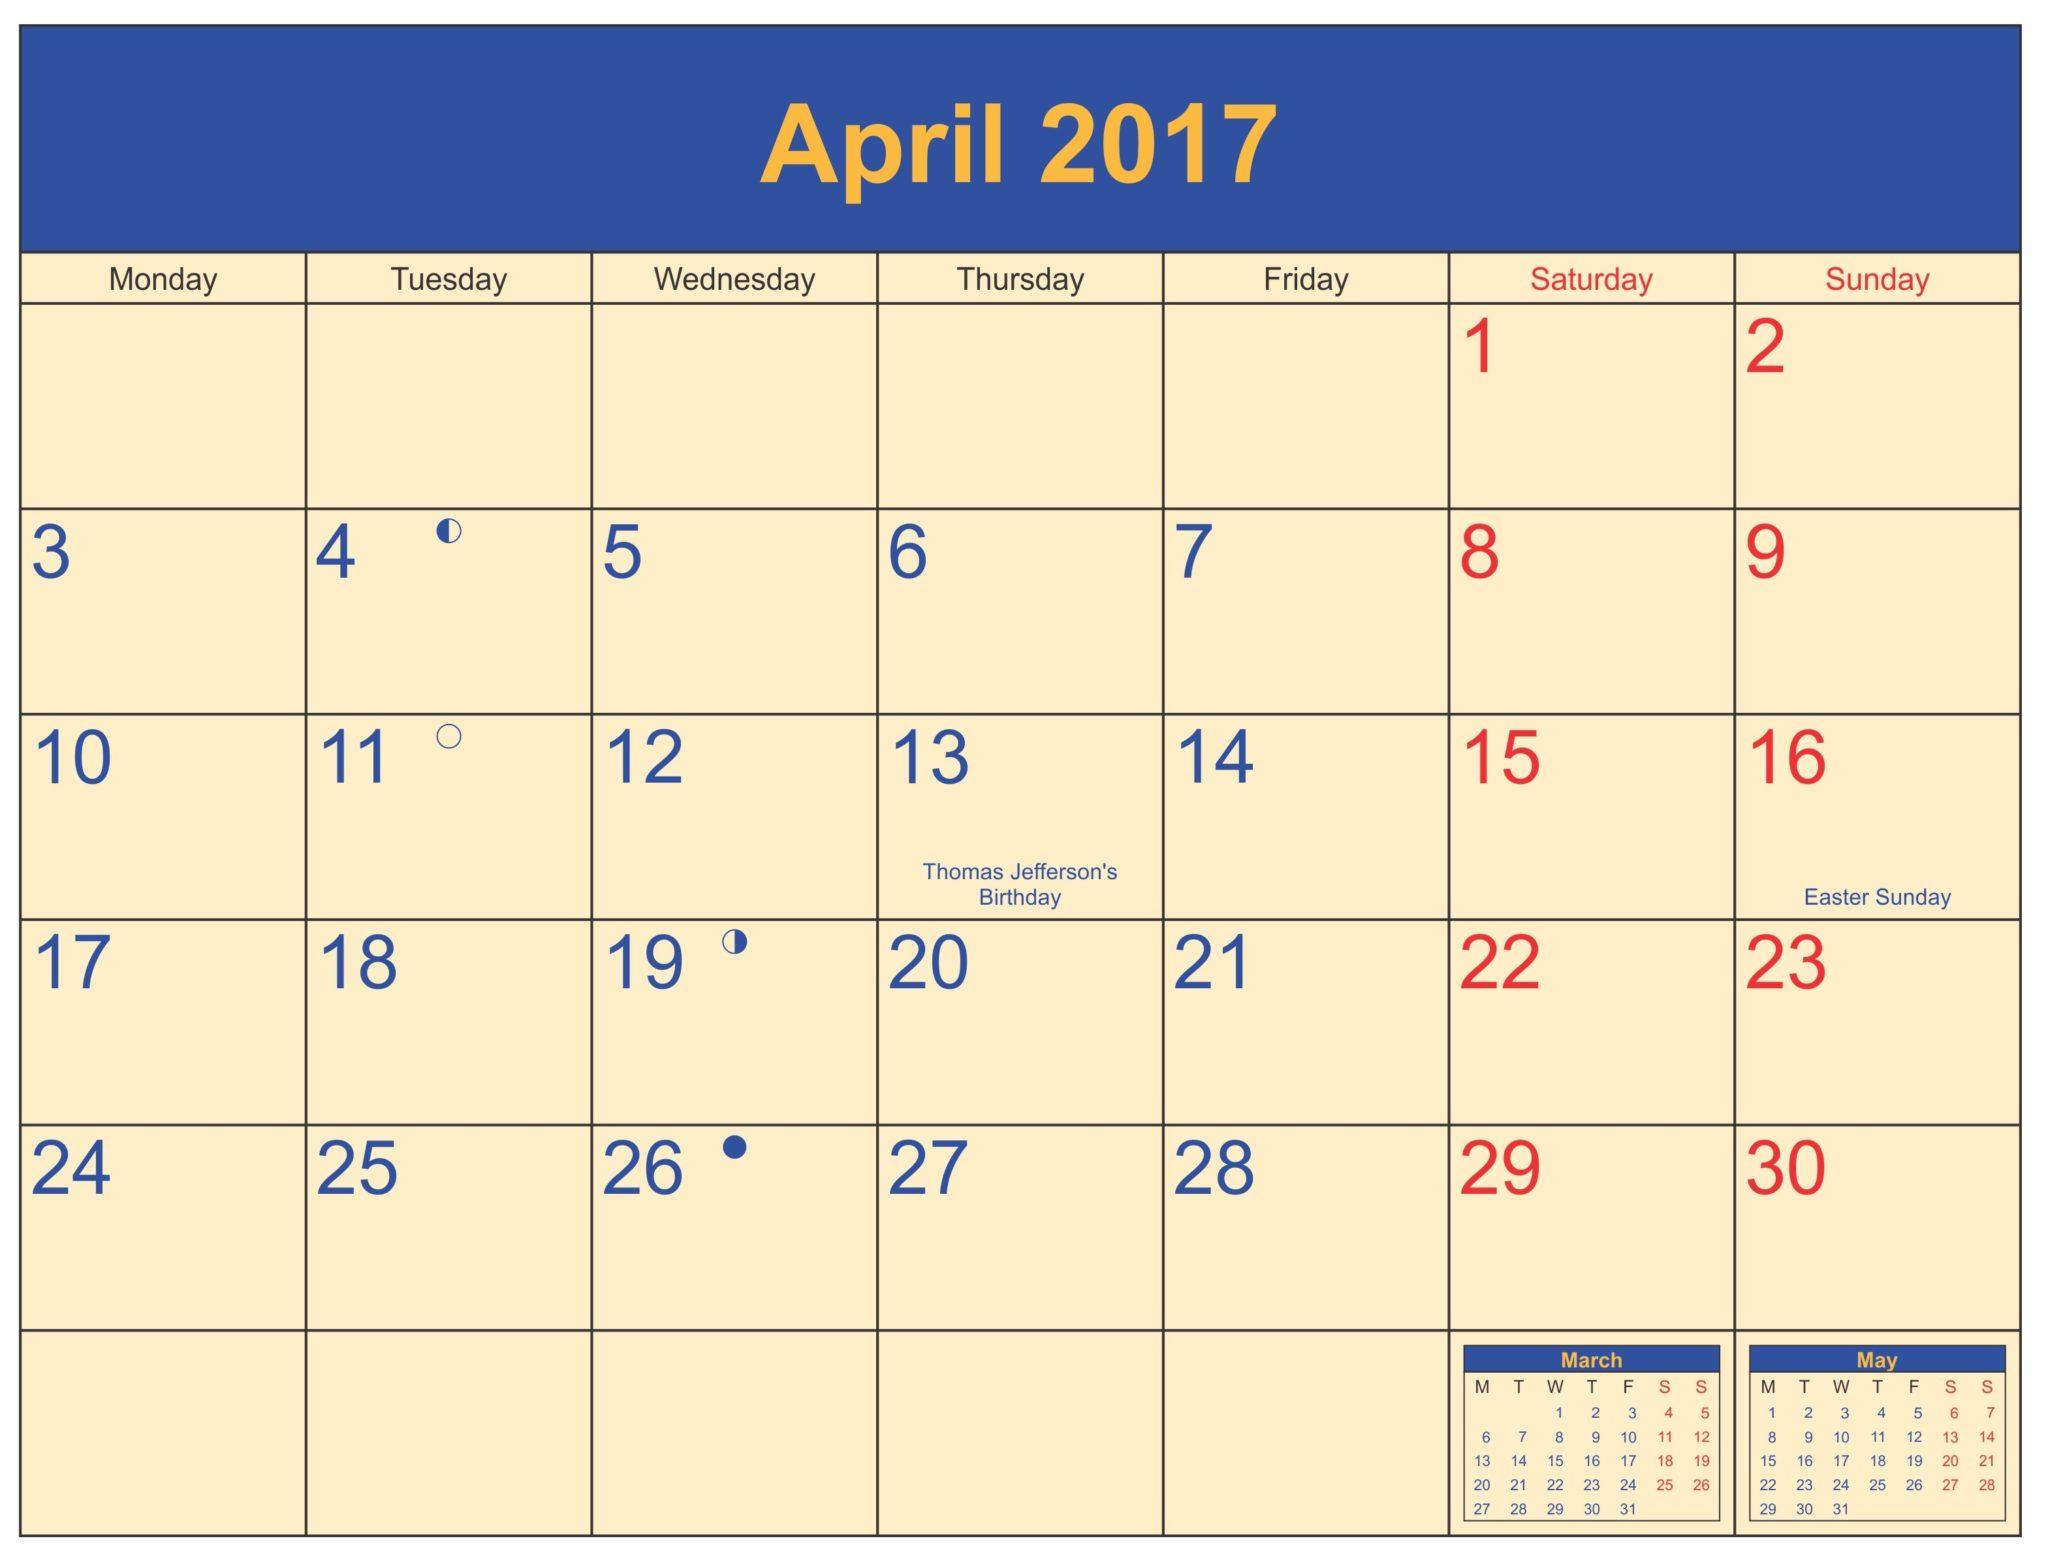 April 2017 Calendar Document